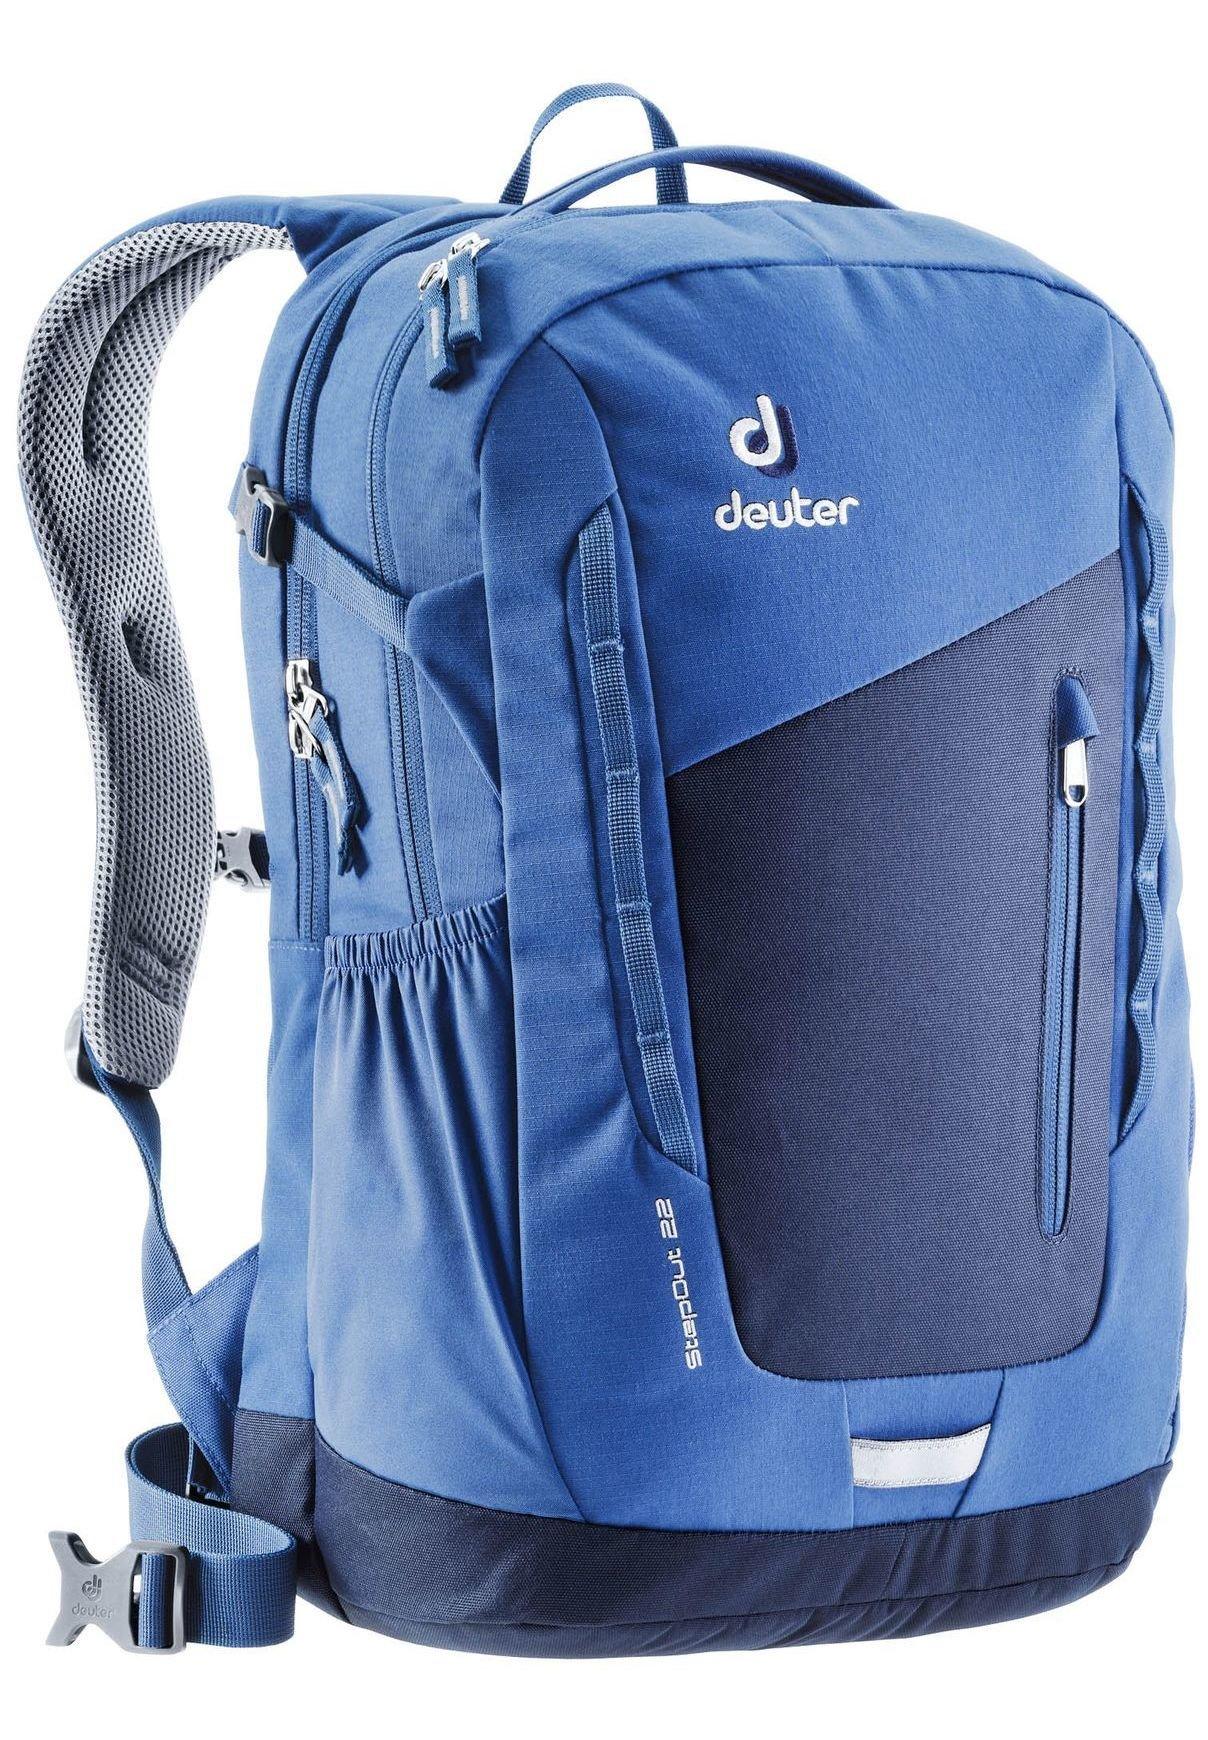 Deuter STEPOUT - Tagesrucksack - navy/steel/blau - Herrentaschen 4wG6J